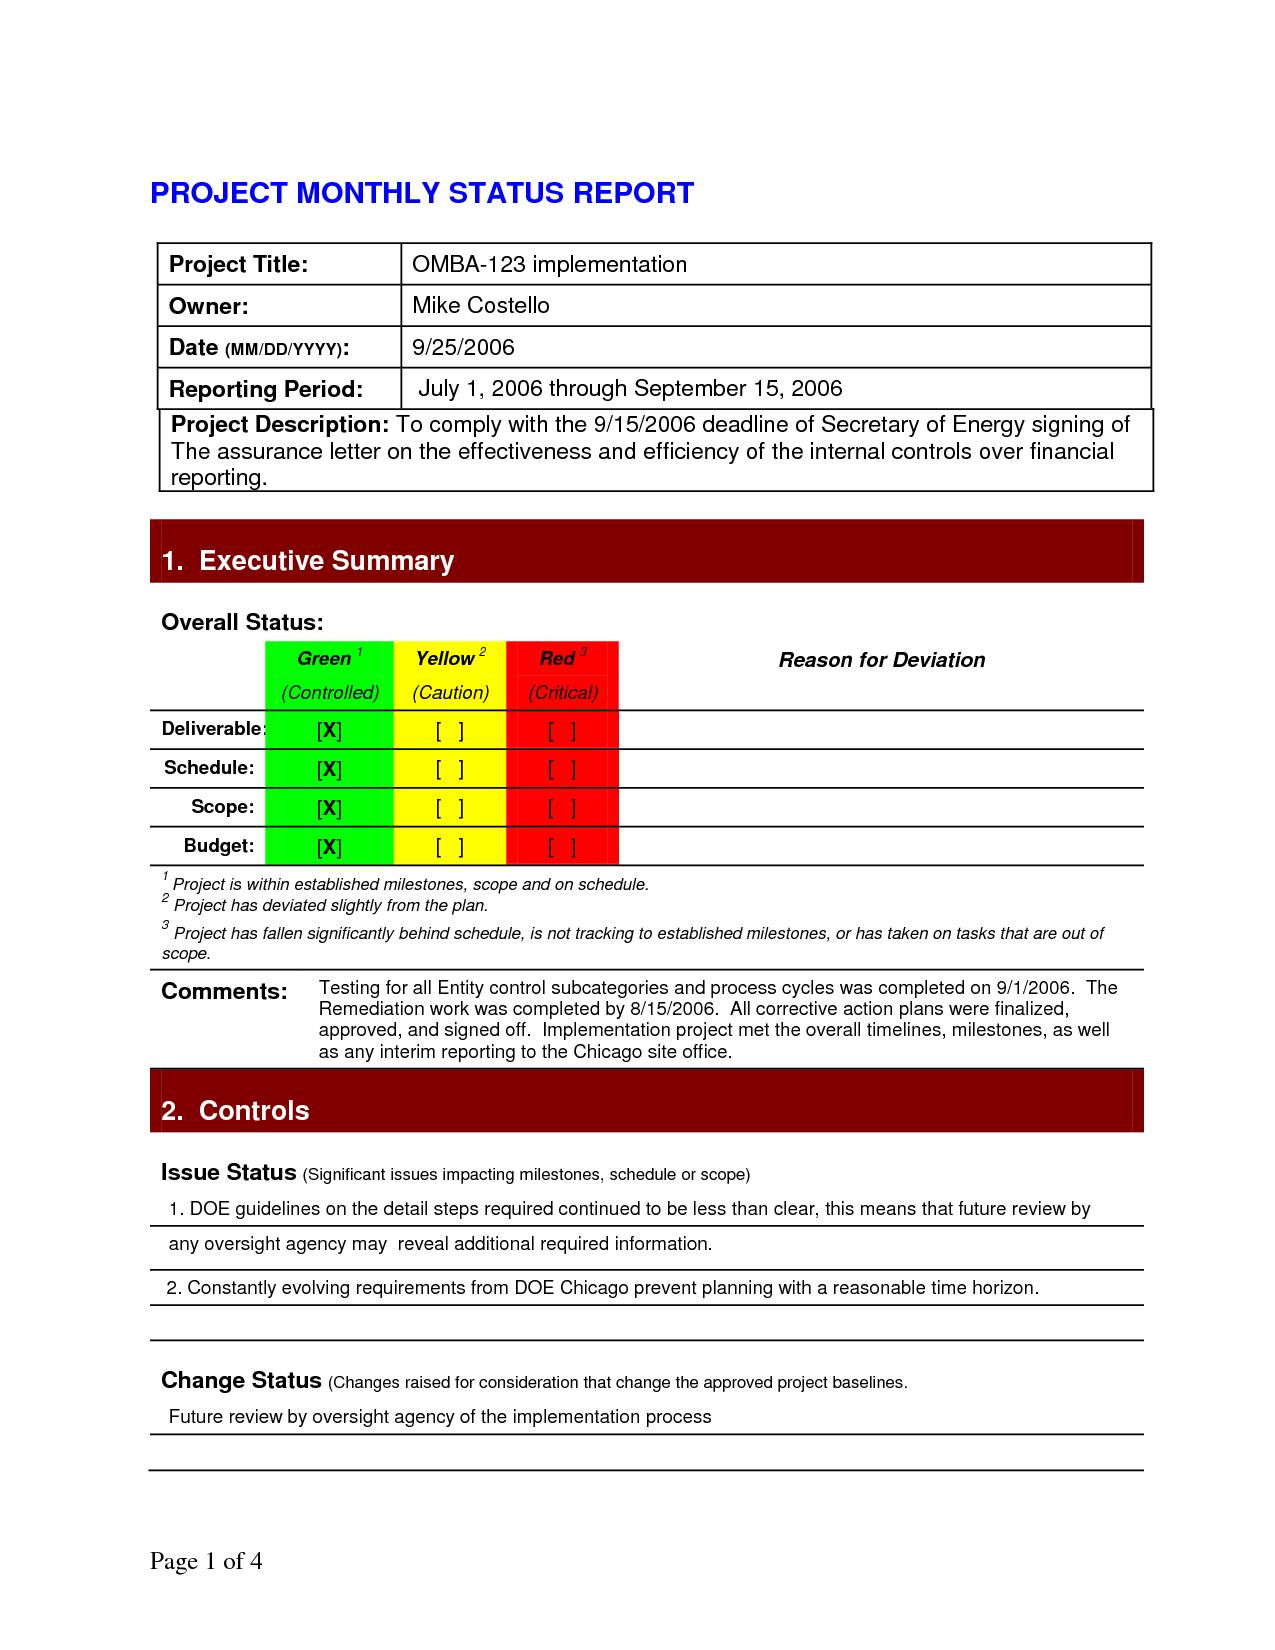 Portfolio Management Reporting Templates and Project Status Report Template 2dfahbab 1275Ã 1650